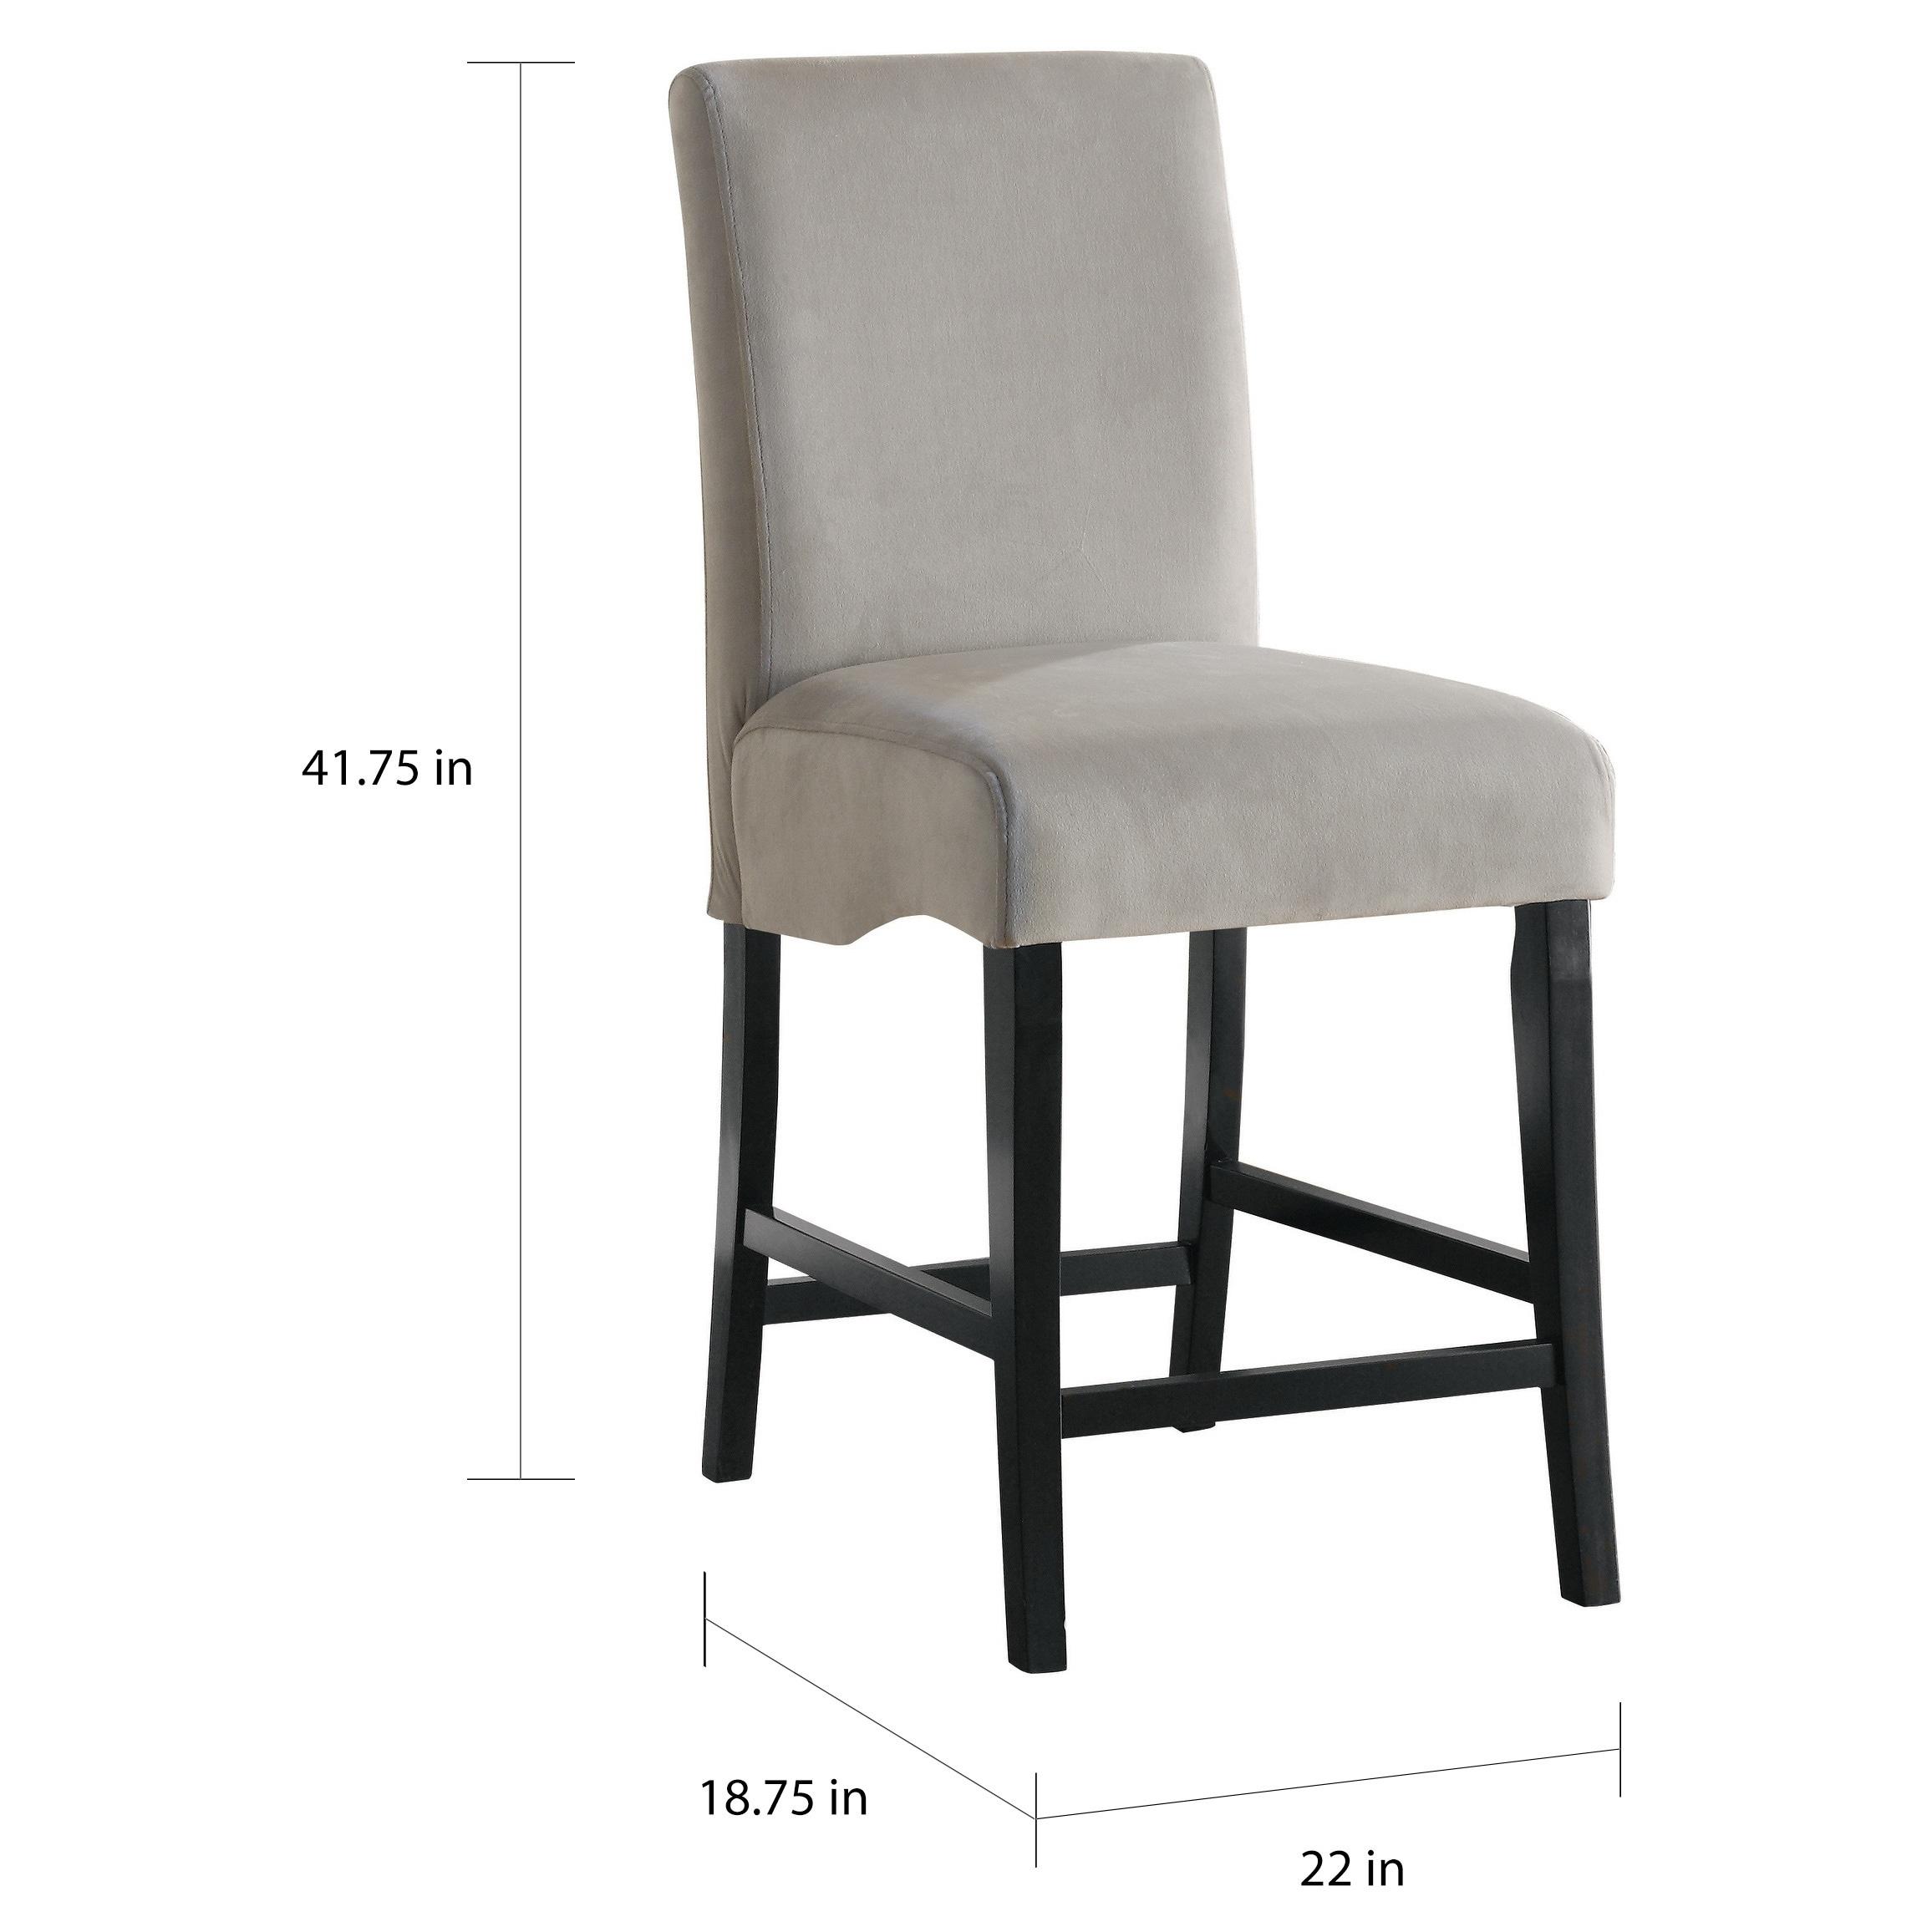 8821de2da0 Shop Stanton Contemporary Black 5-piece Dining Set - Free Shipping Today -  Overstock - 21782208